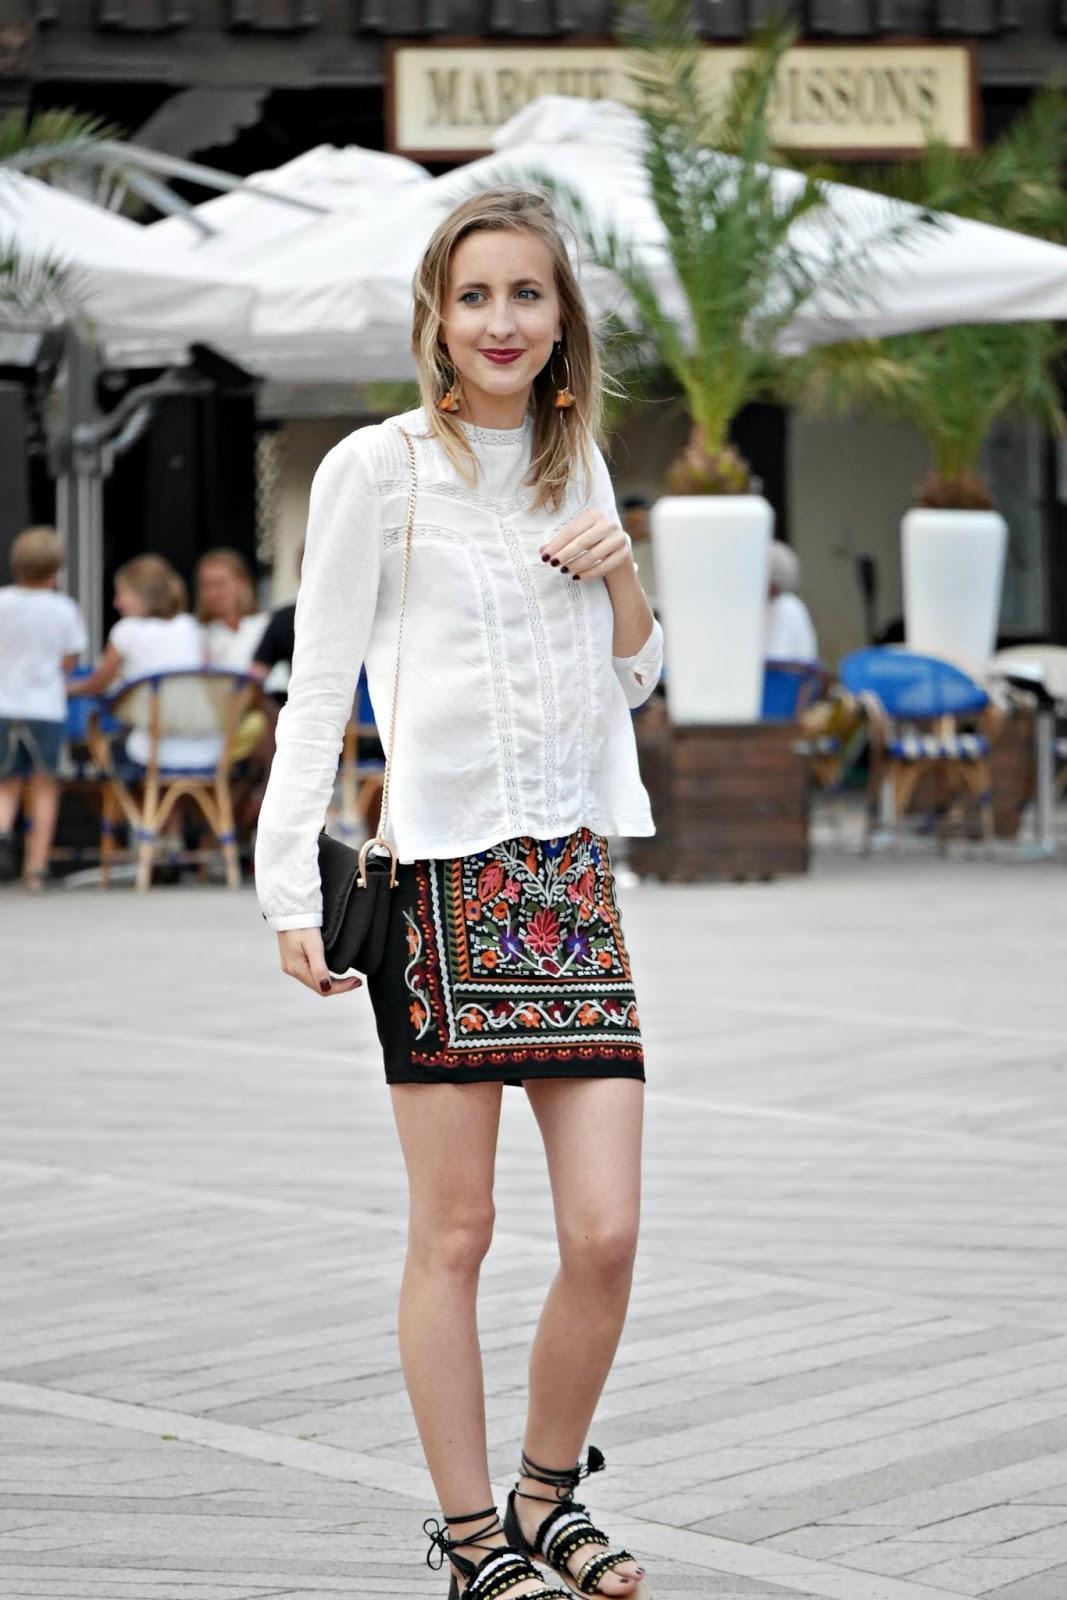 jupe brodée - blouse dentelle